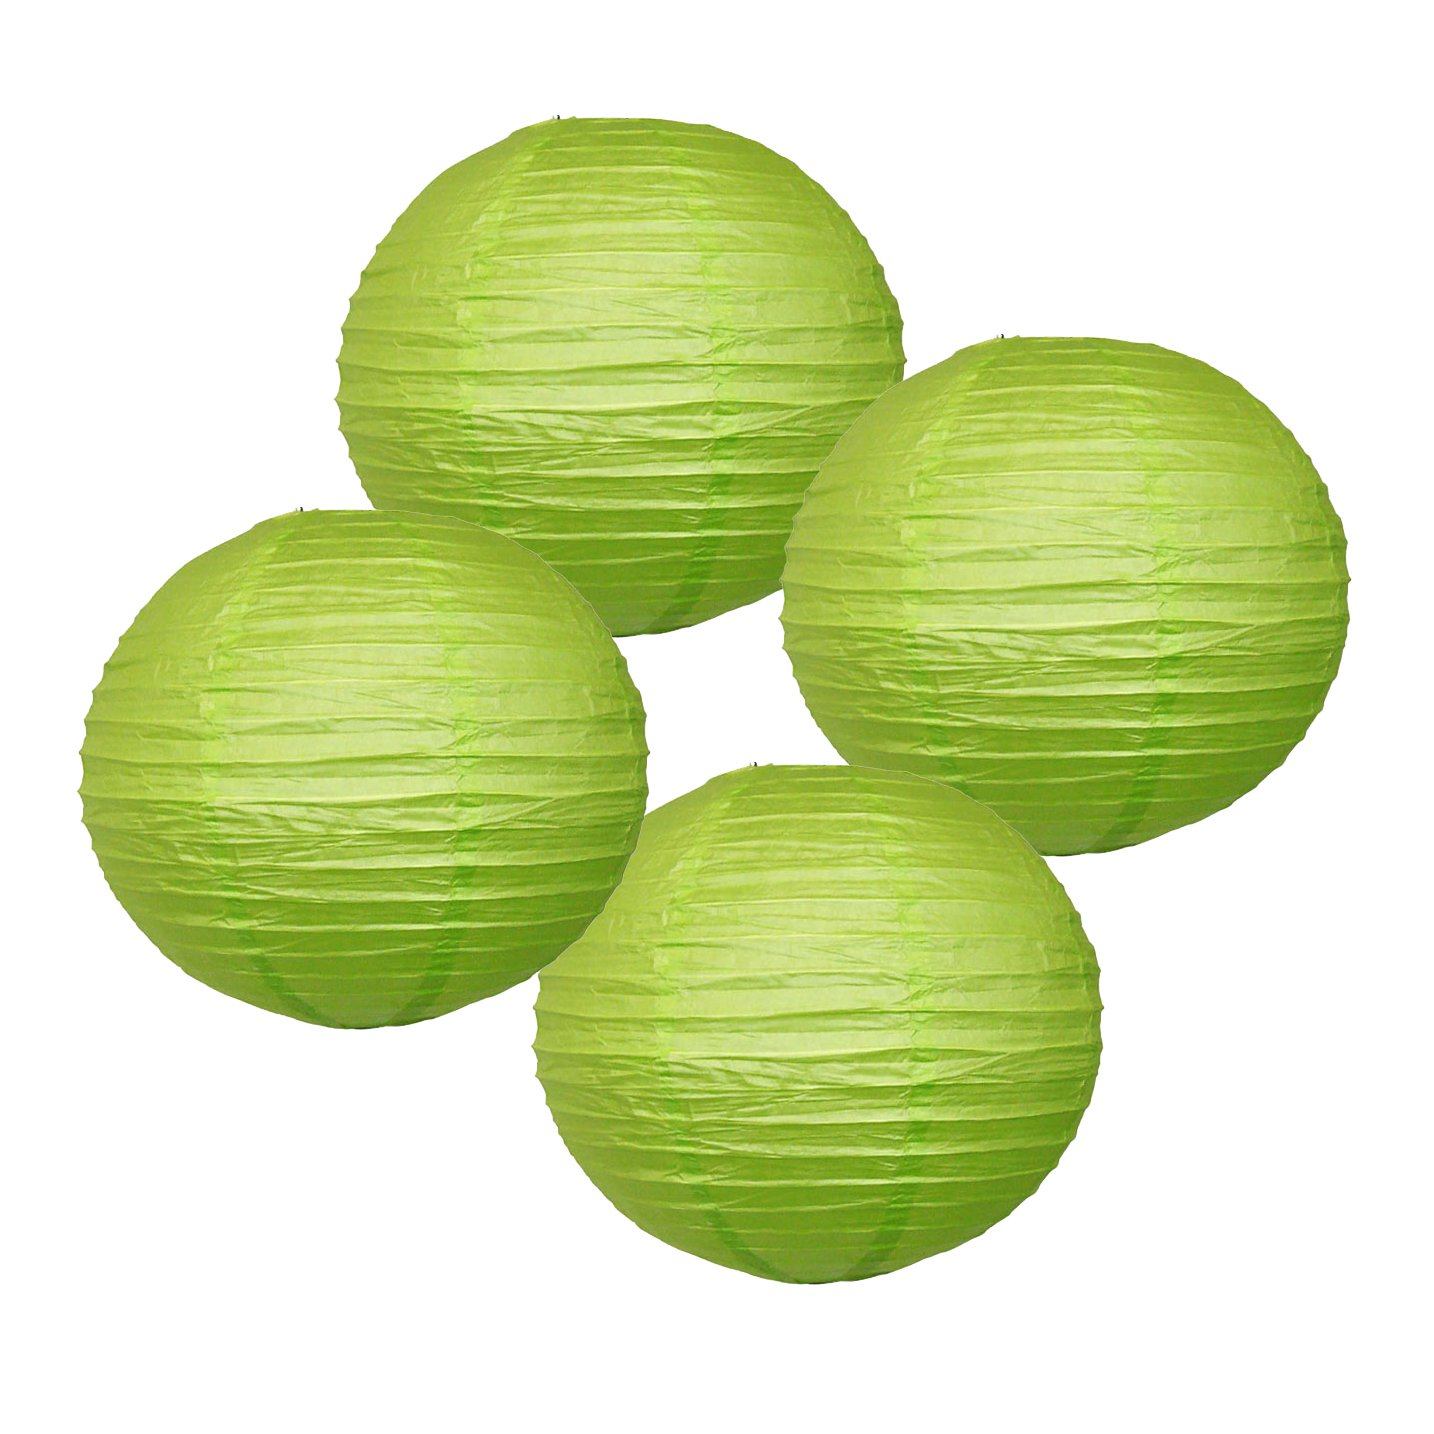 Just Artifacts 様々な紙製ランタン(色とサイズの異なる紙のランタン) 6inch AMZ-RPL4-060017 B01EGXJXN6 6inch ライトグリーン ライトグリーン 6inch